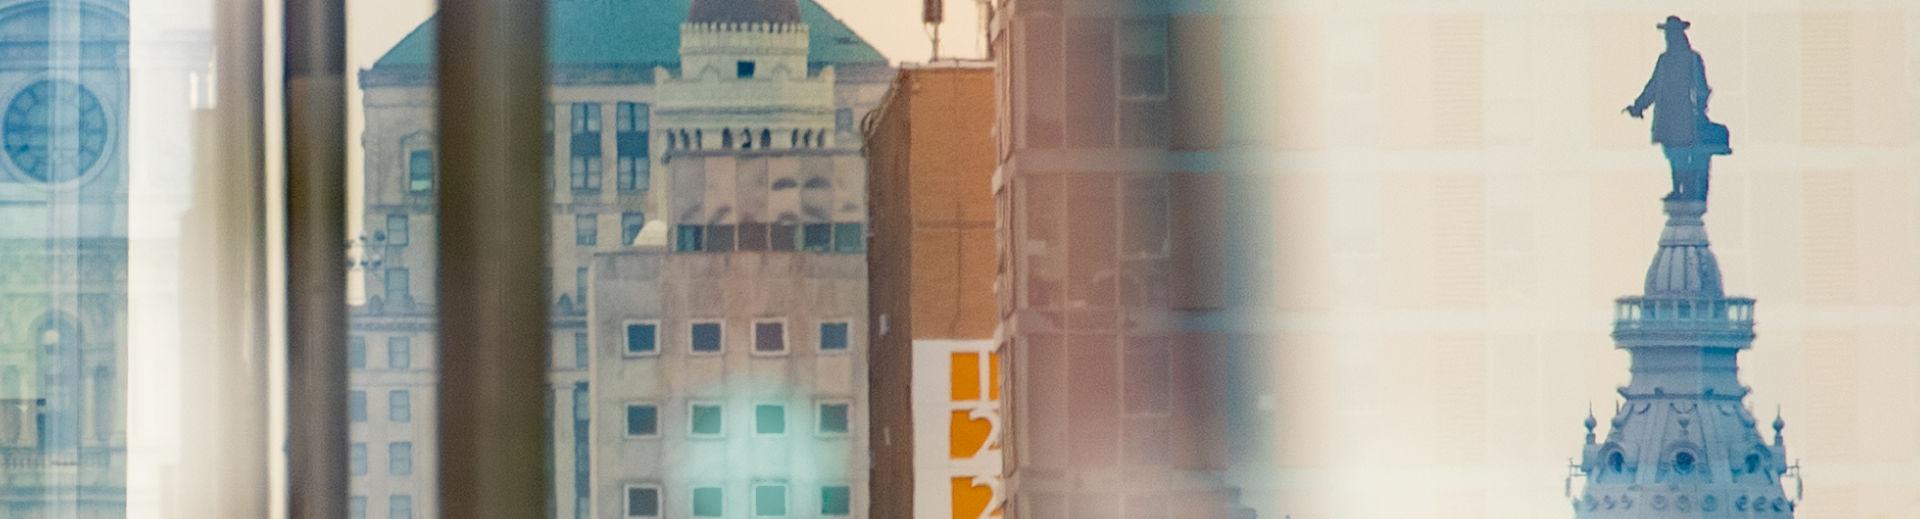 A multi-layered image of the Philadelphia cityscape